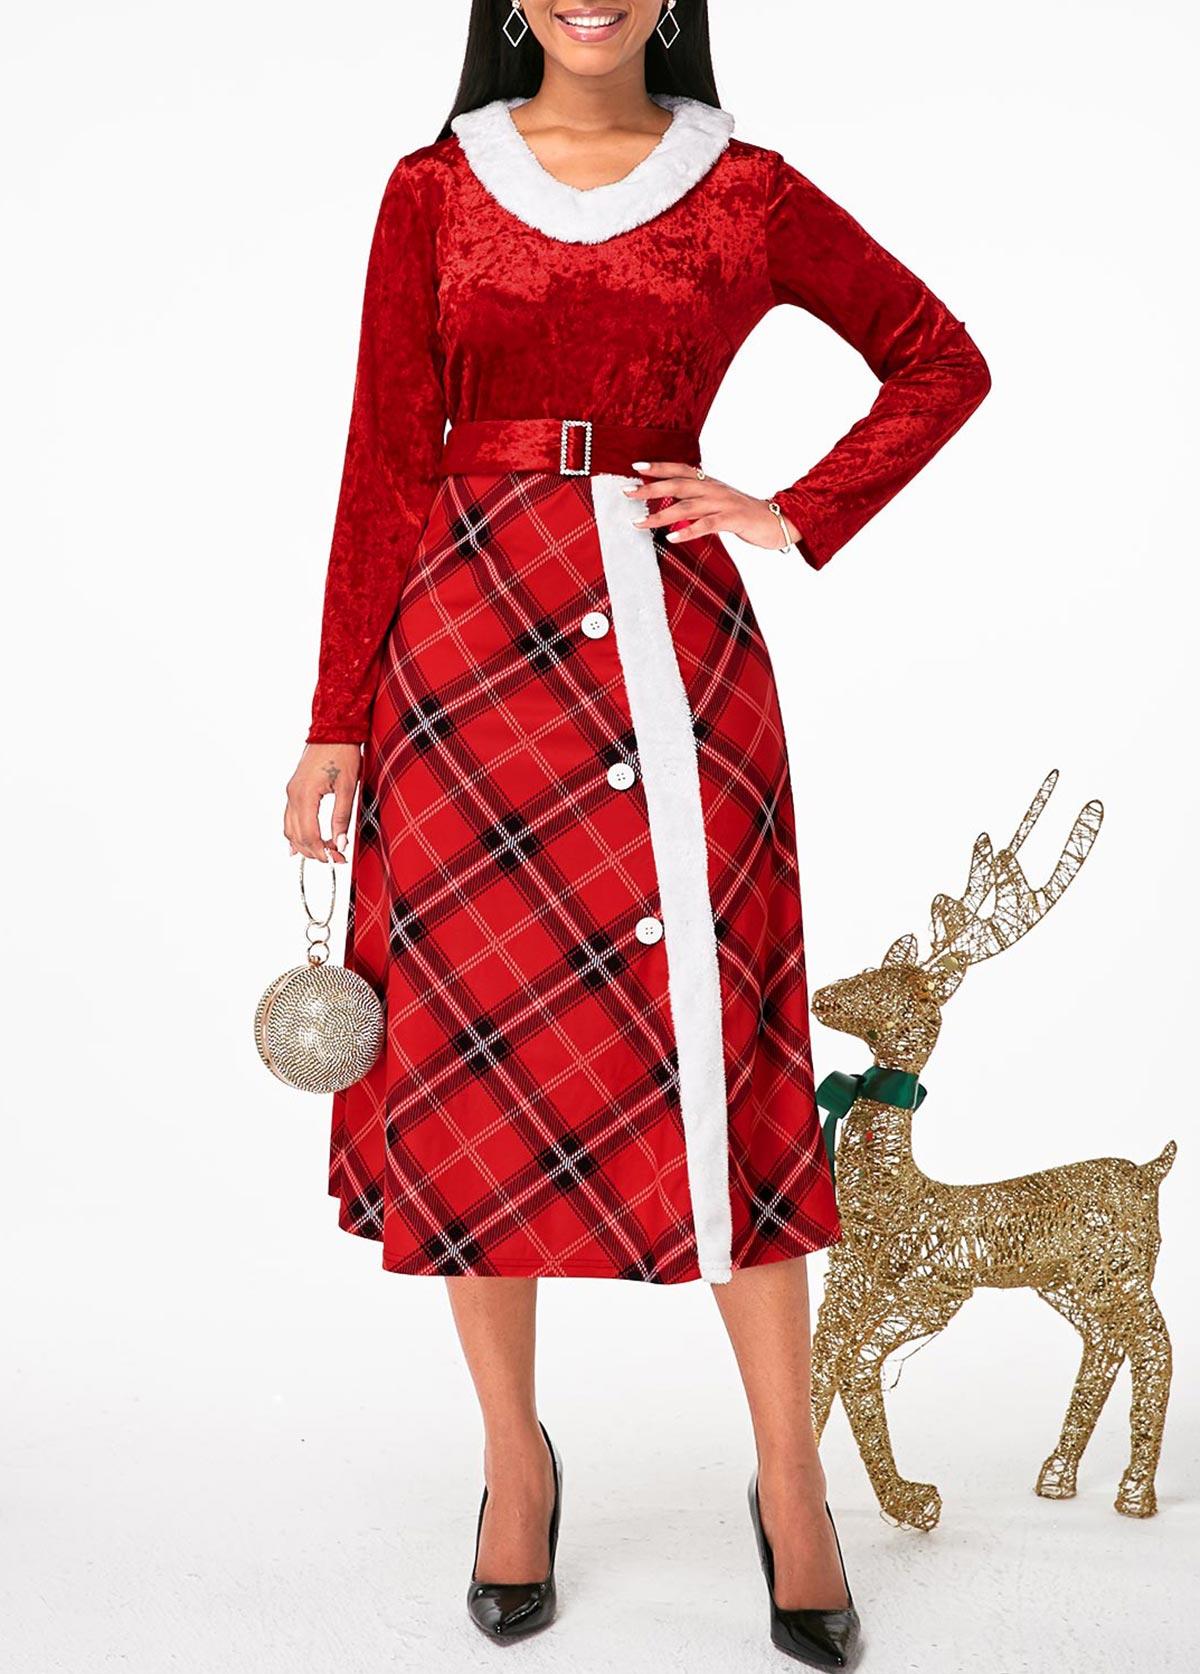 ROTITA Buckle Belted Faux Fur Collar Plaid Print Dress